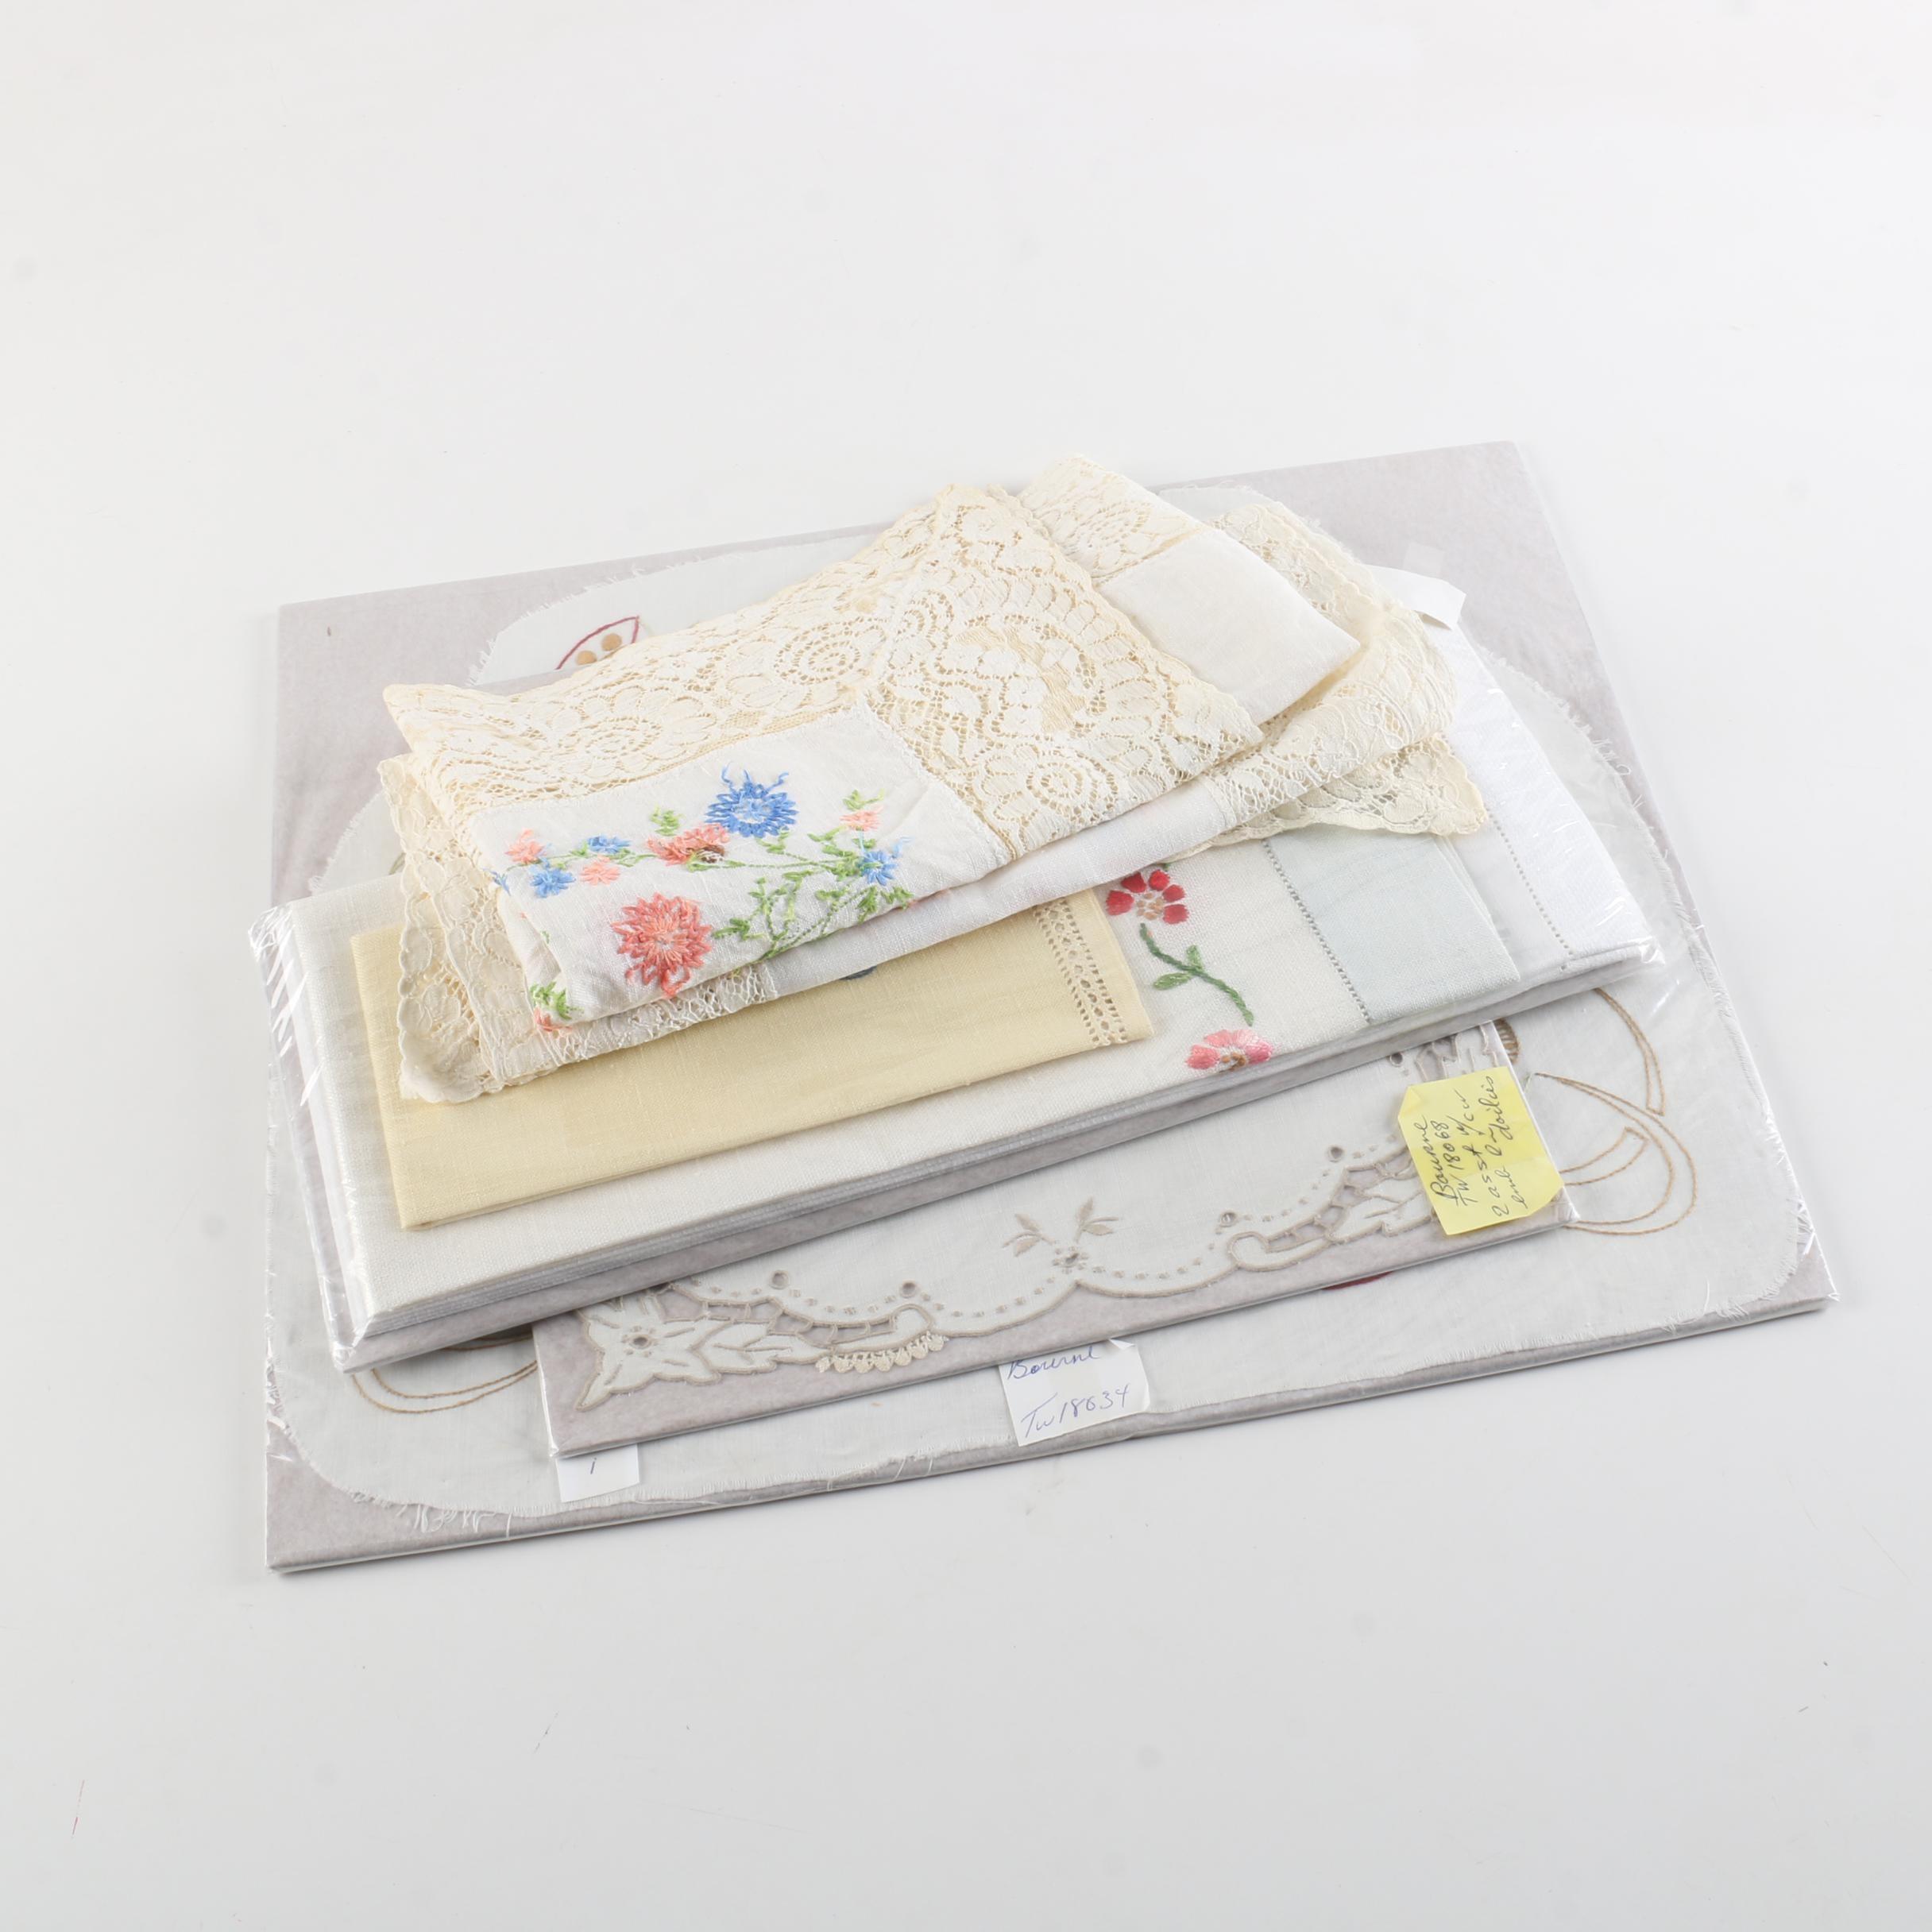 Doilies, Hand Towels, and Handkerchiefs